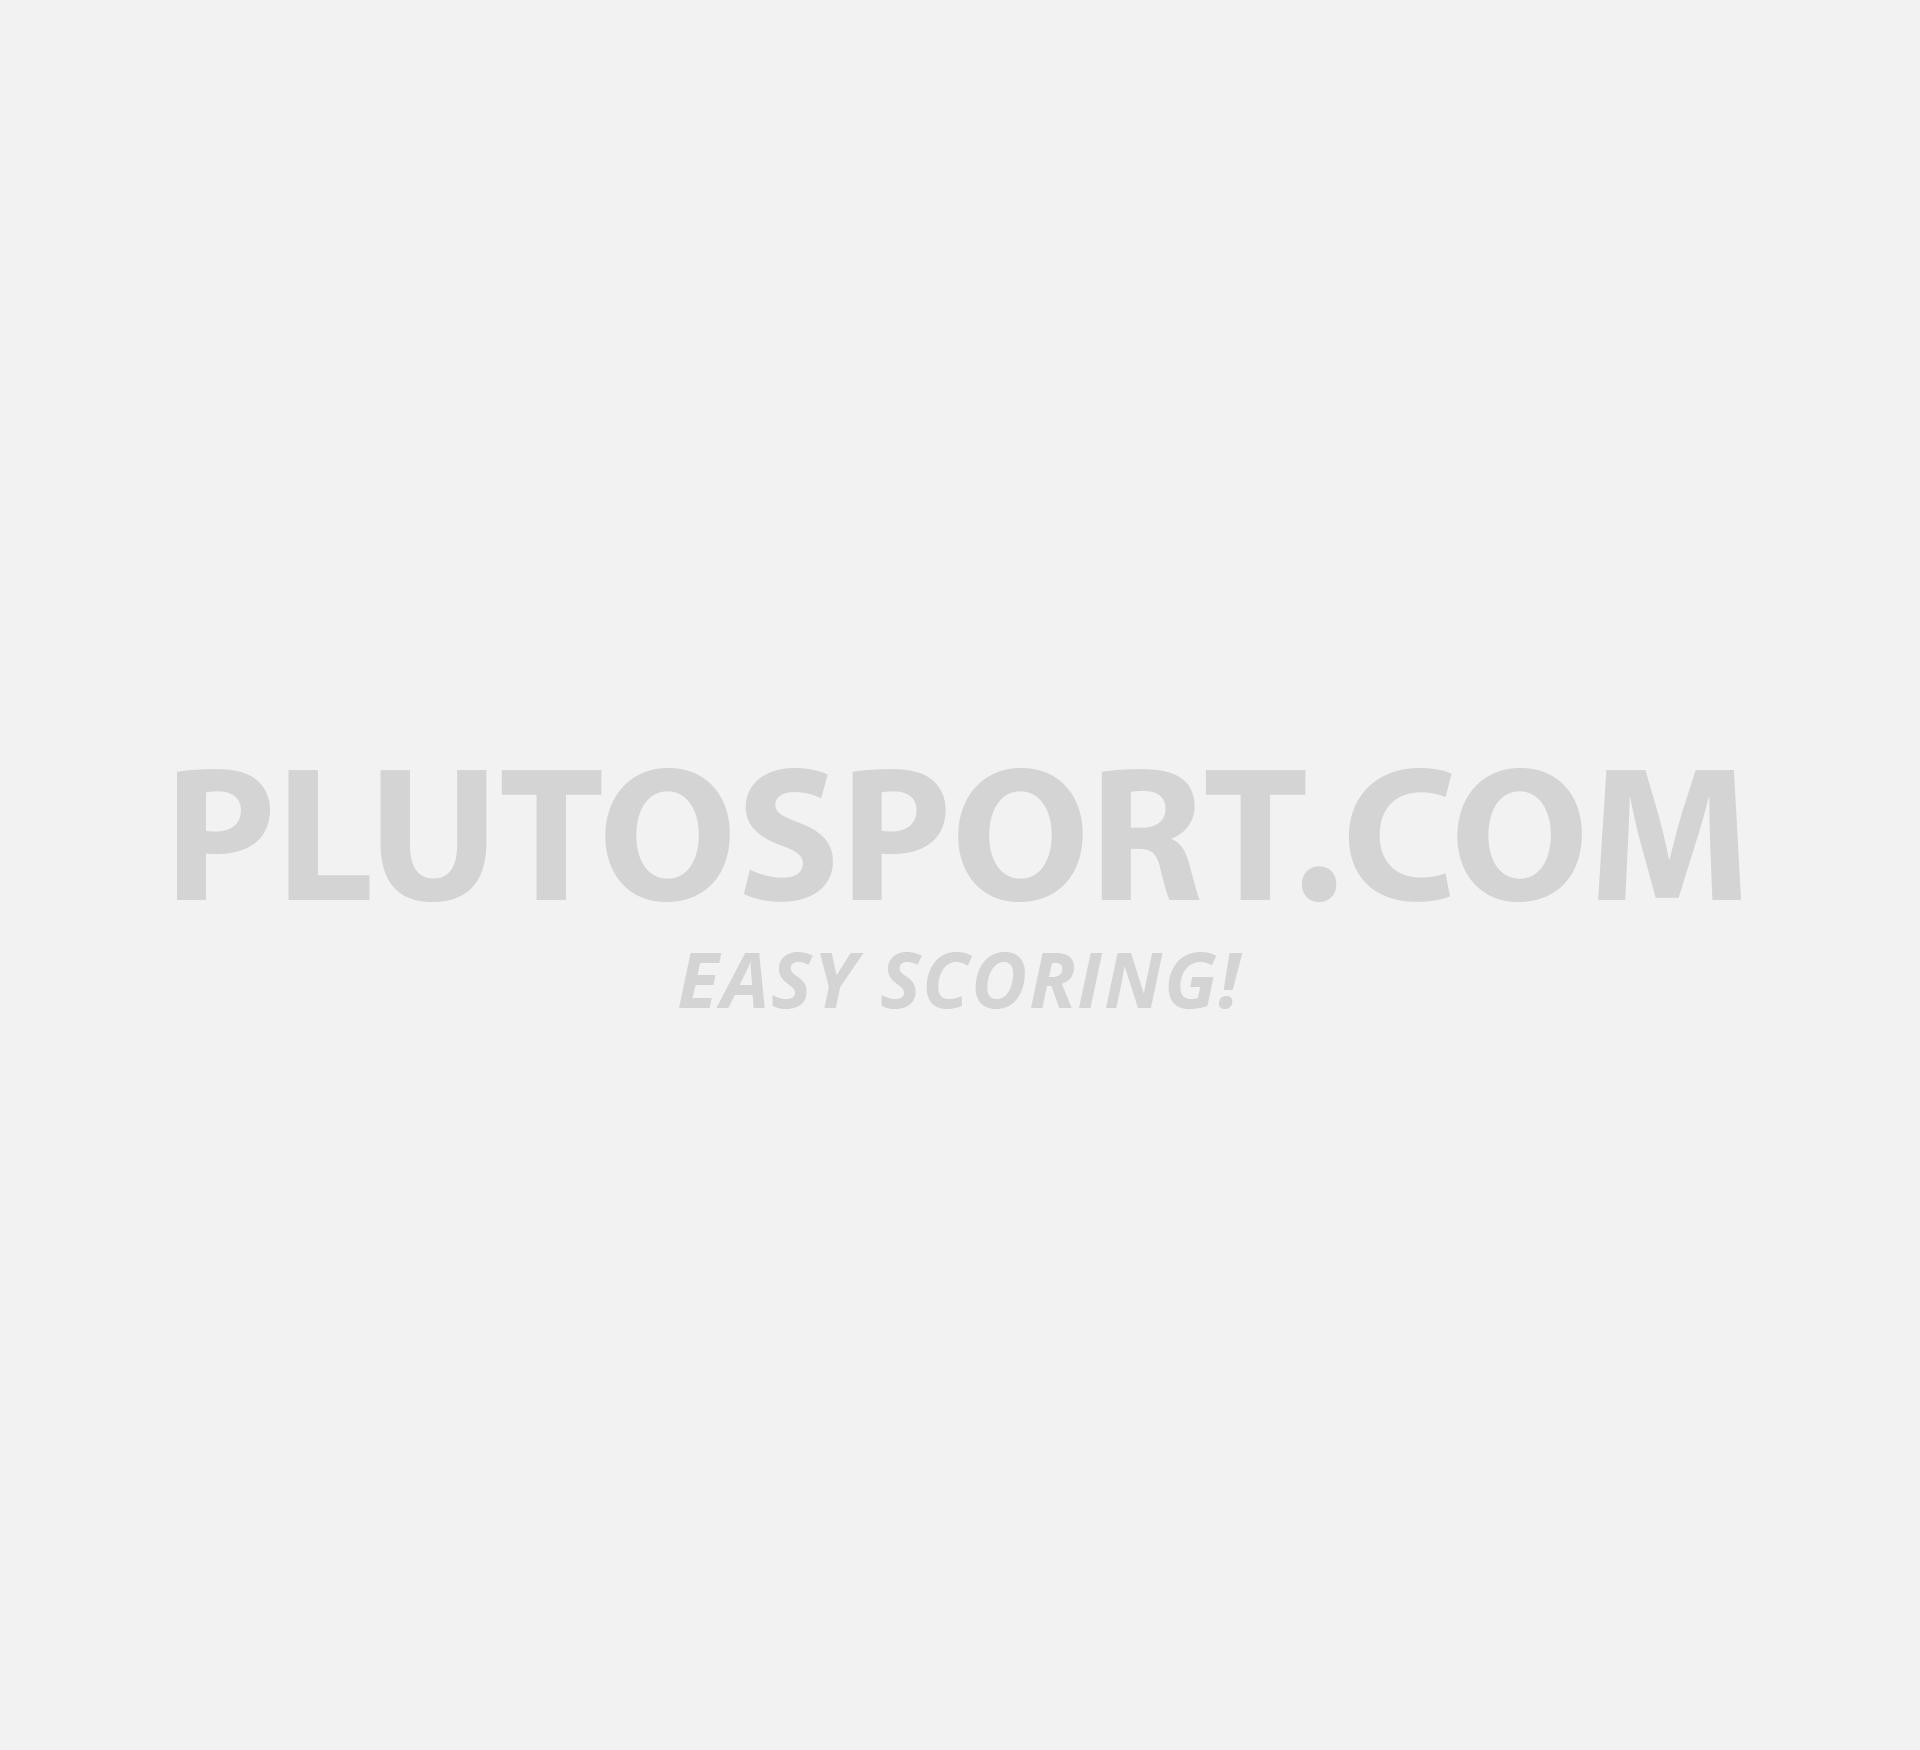 Puma Tas Dames : Puma lutea mid nm fitnessshoe women s shoes fitness